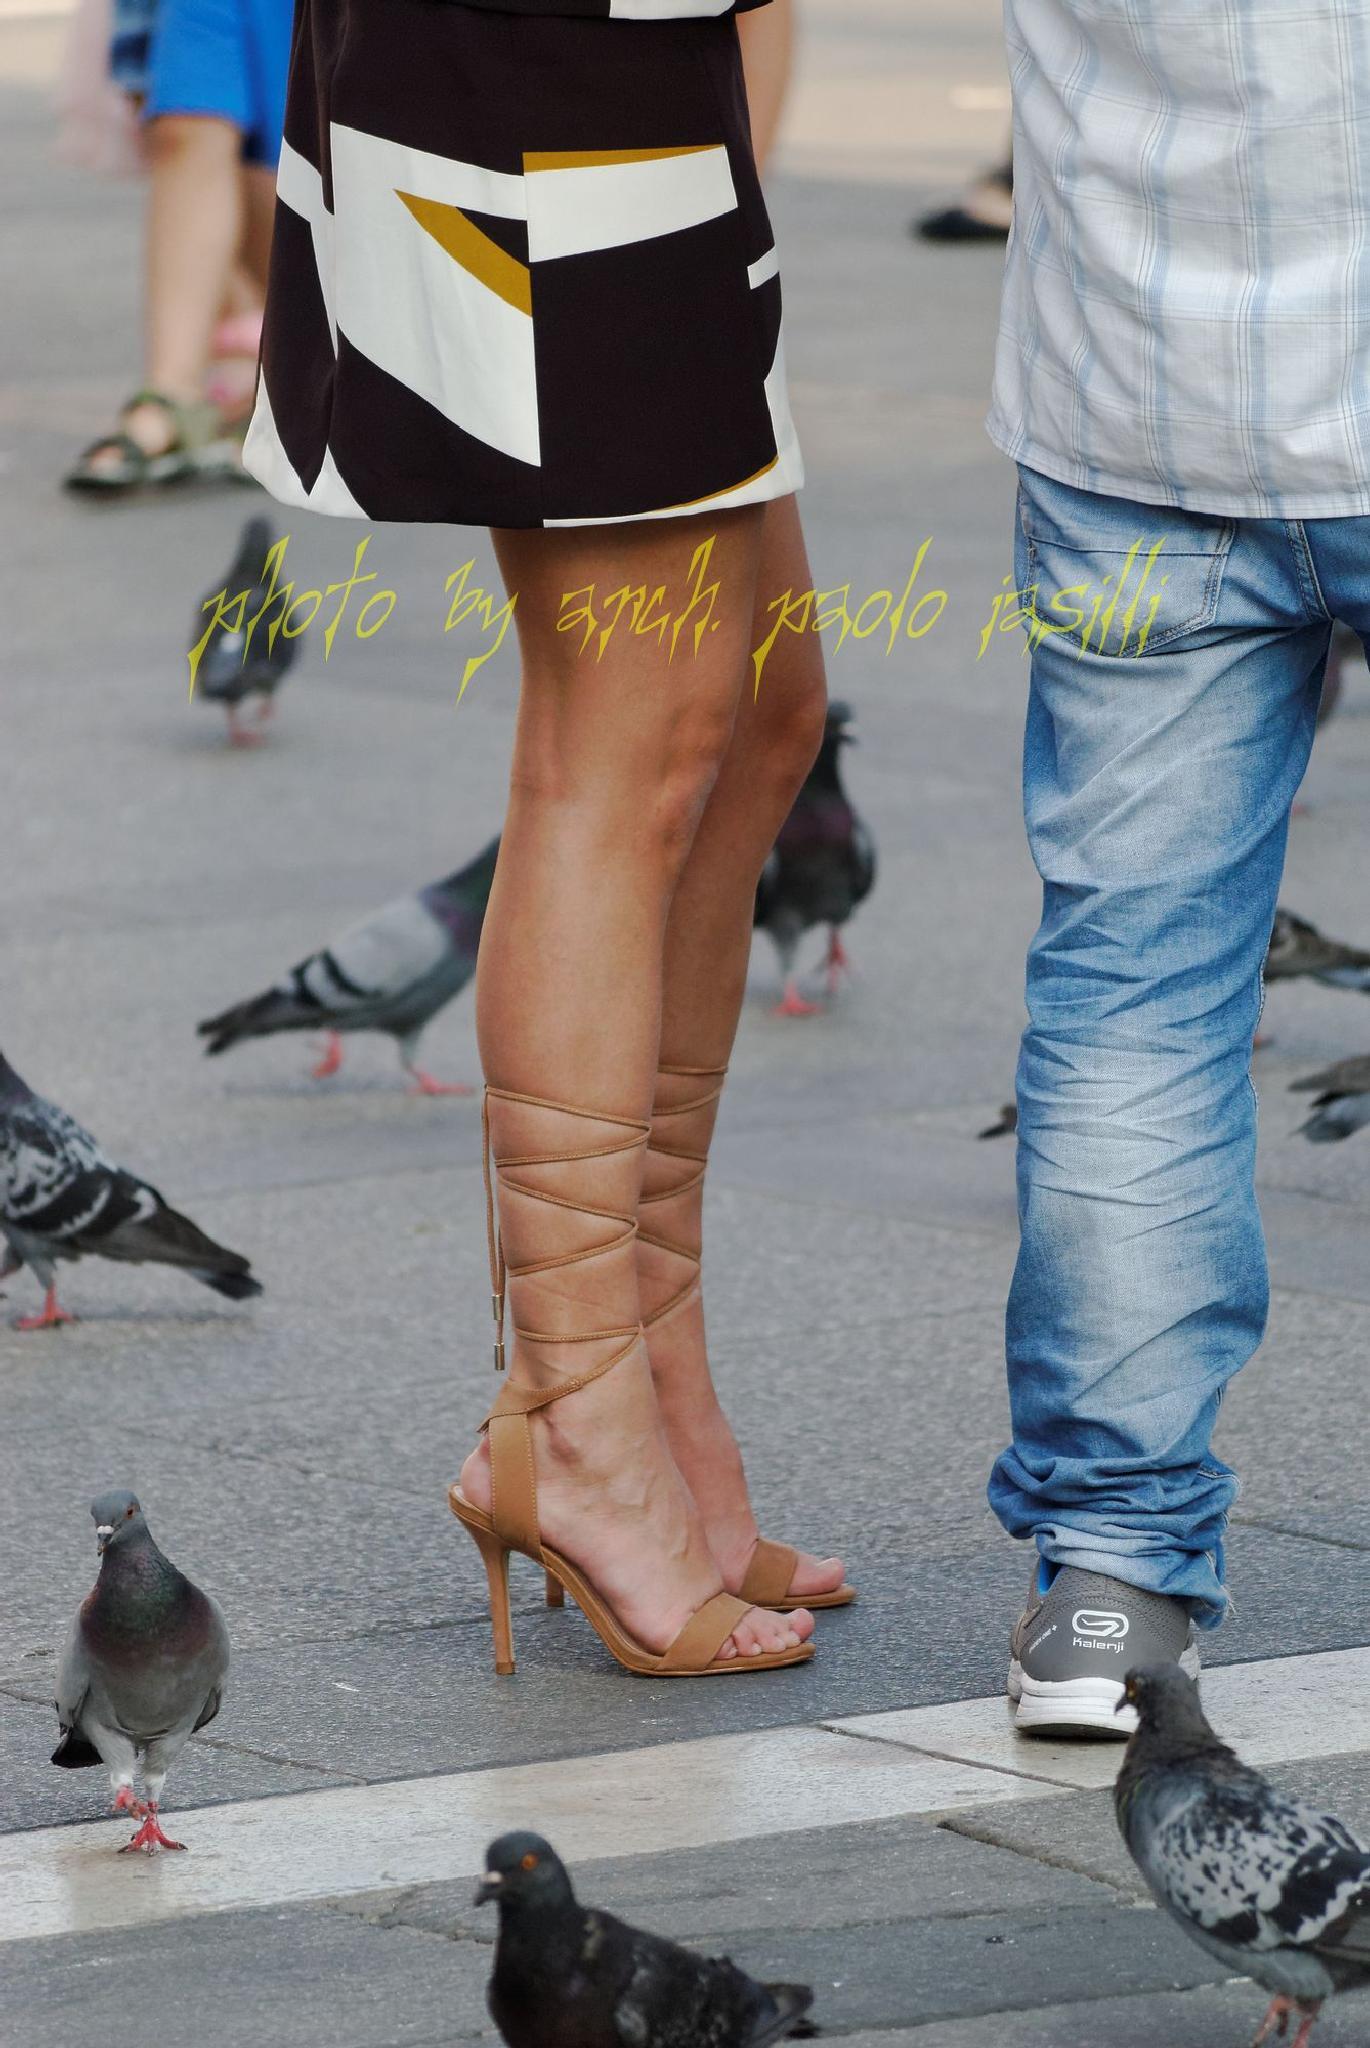 SCARPE FEMMINILI ESTIVE by INSTAGRAMpaolo_fashionstreet